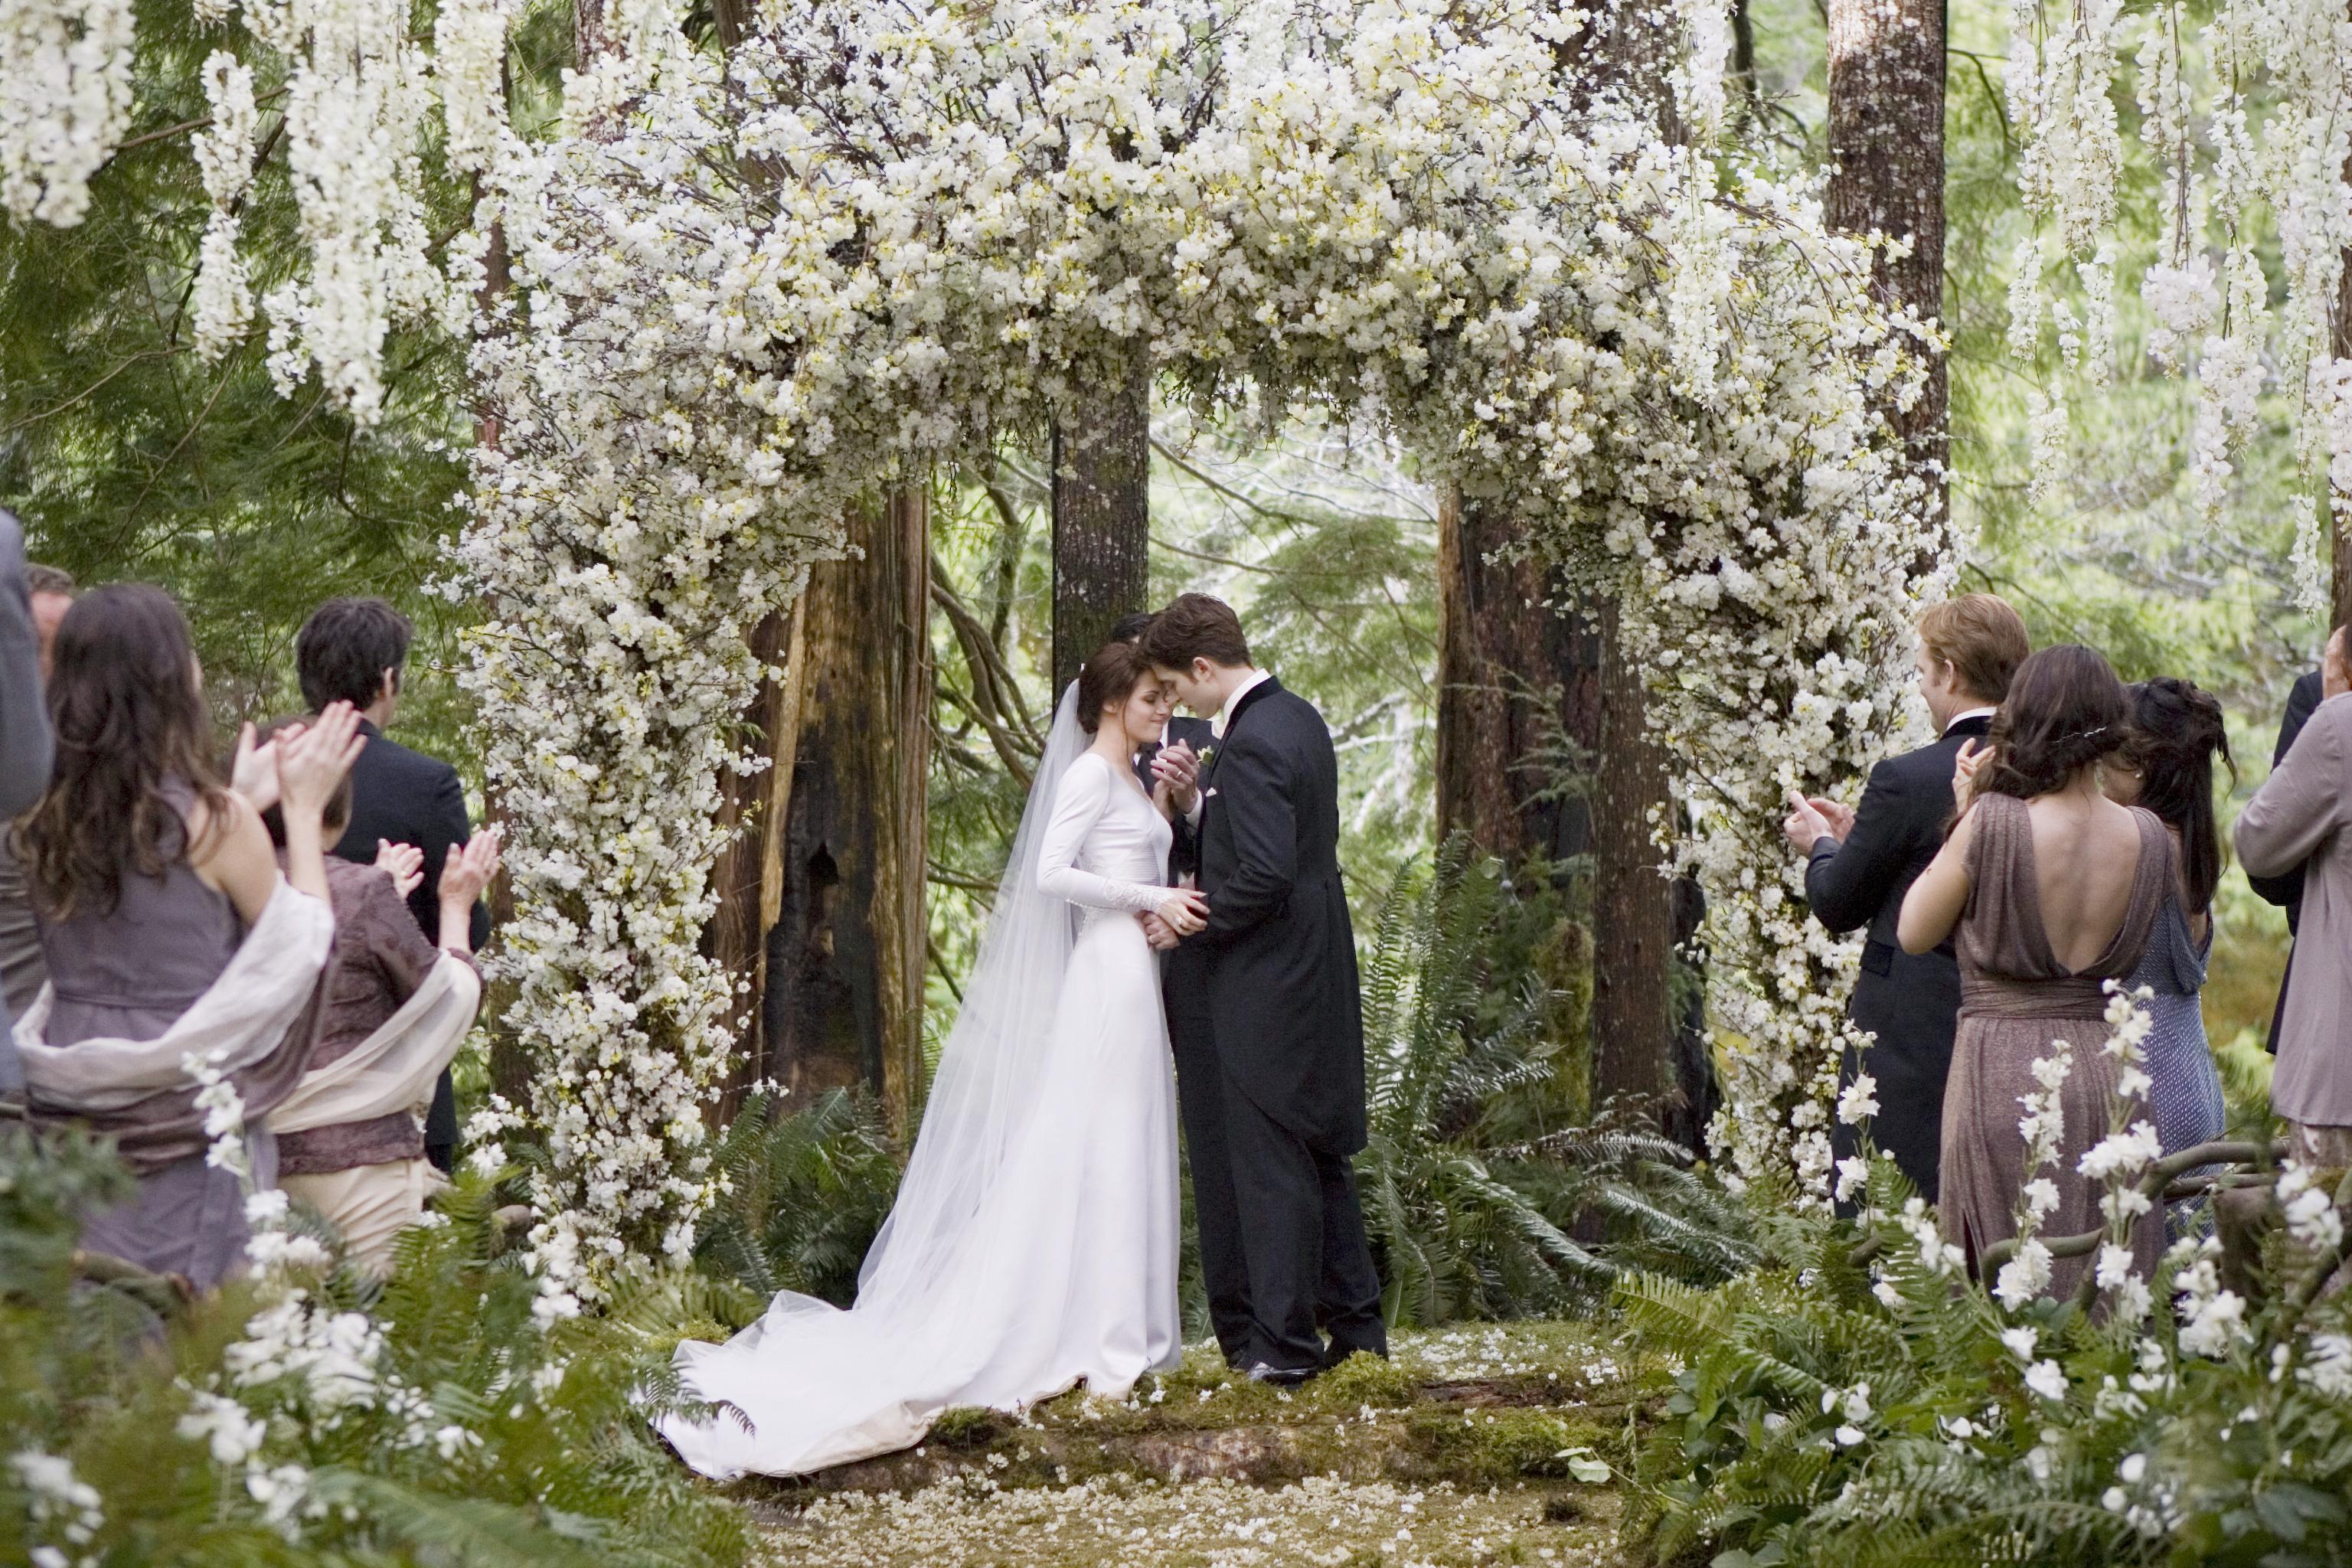 Эро свадьба фото 3 фотография